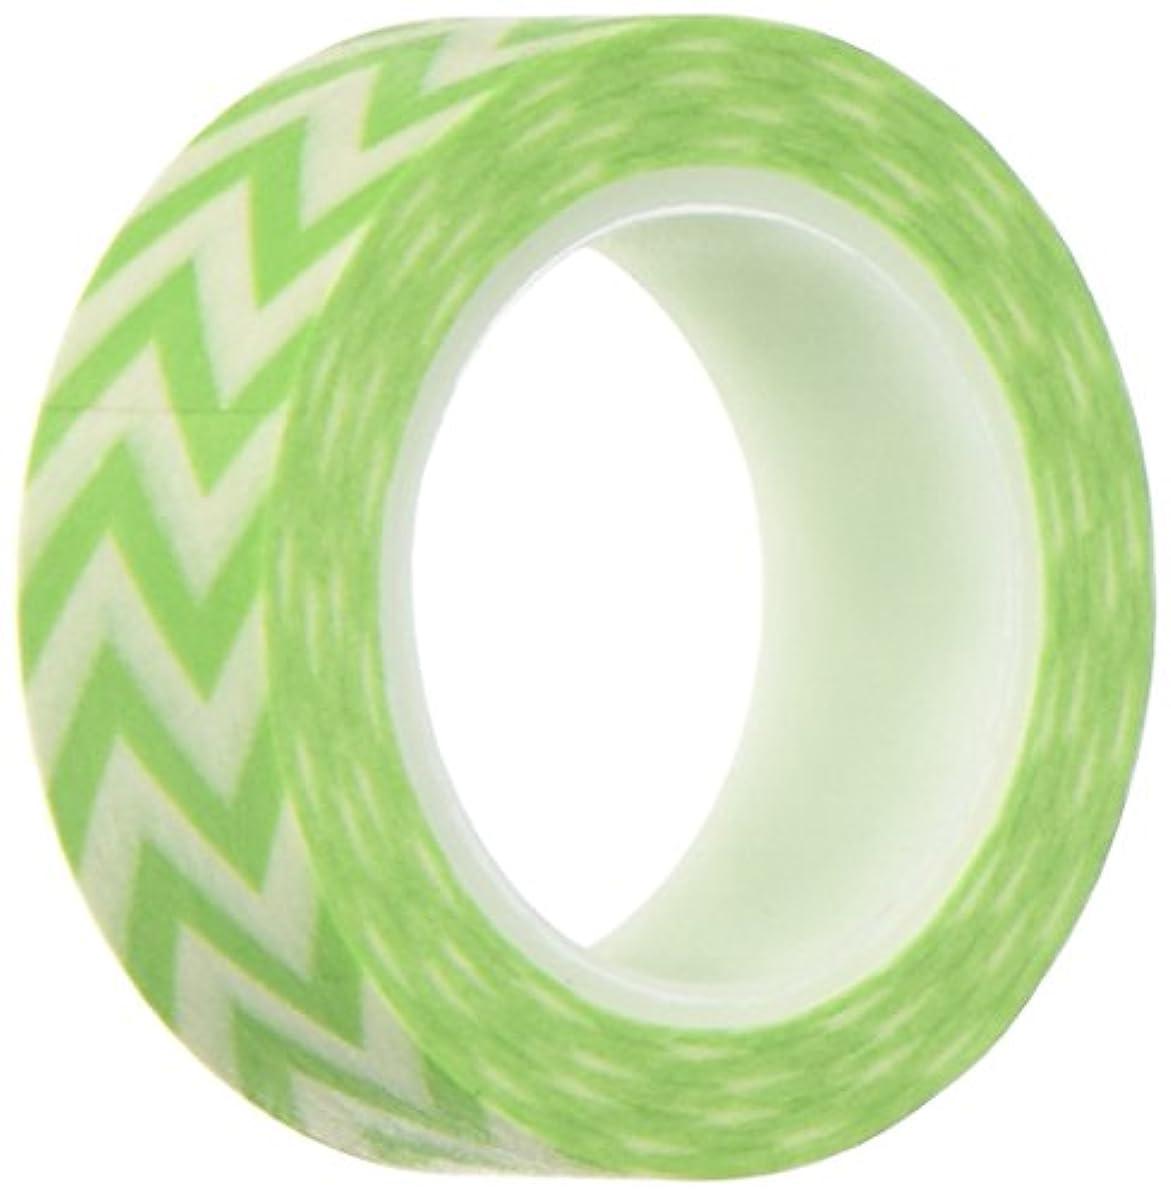 Wrapables Striped Japanese Washi Masking Tape, Lime Green Short Chevron